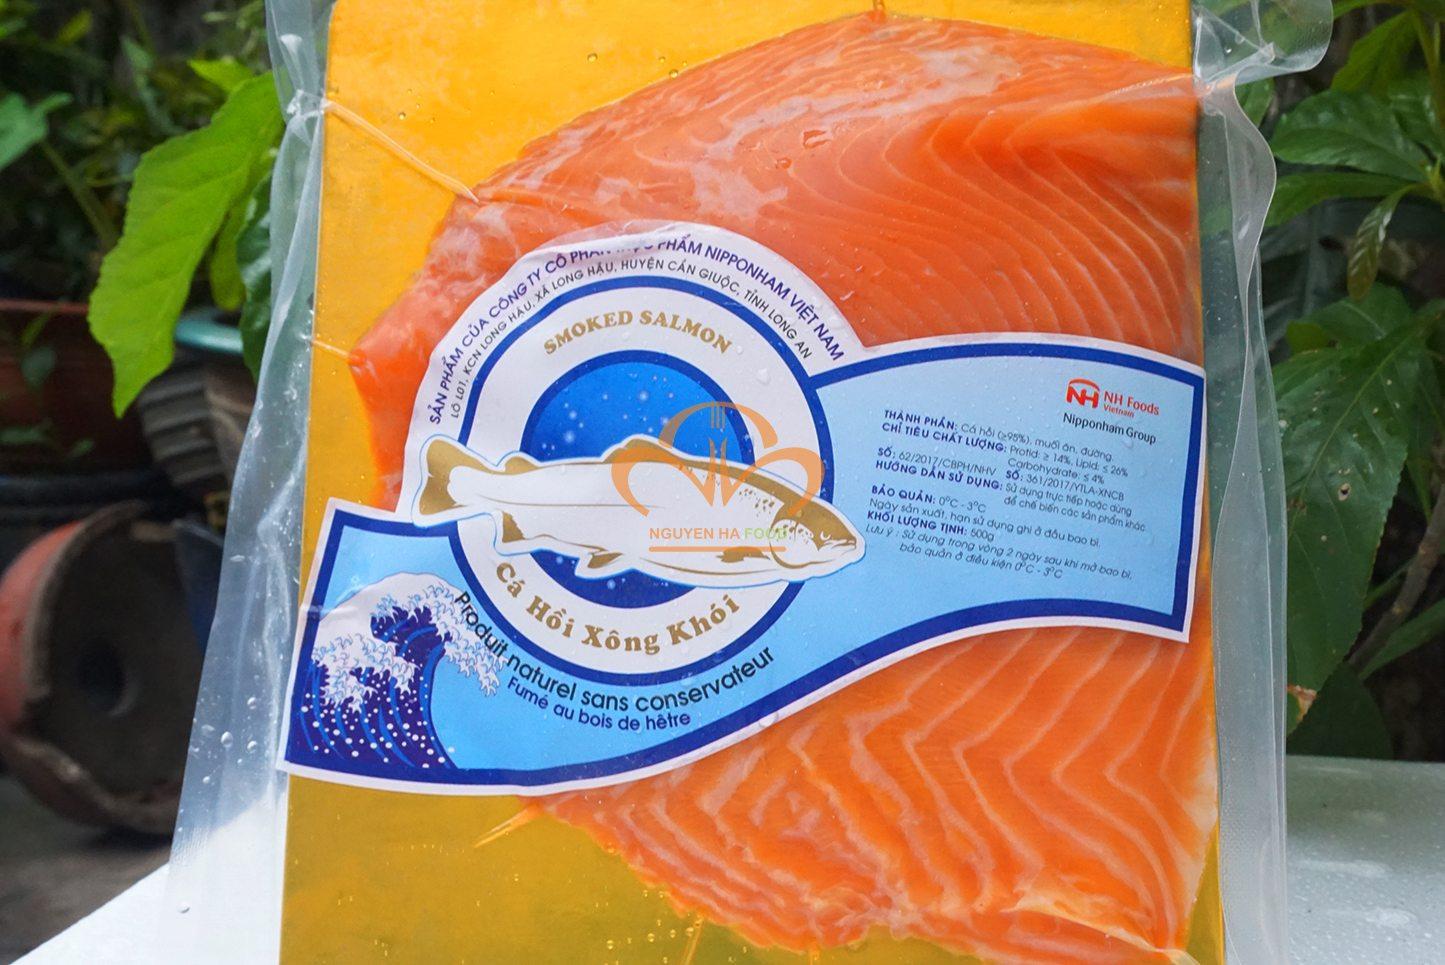 thit-ca-hoi-xong-khoi-co-nguyen-mieng-da-smoked-salmon-skin-on-3